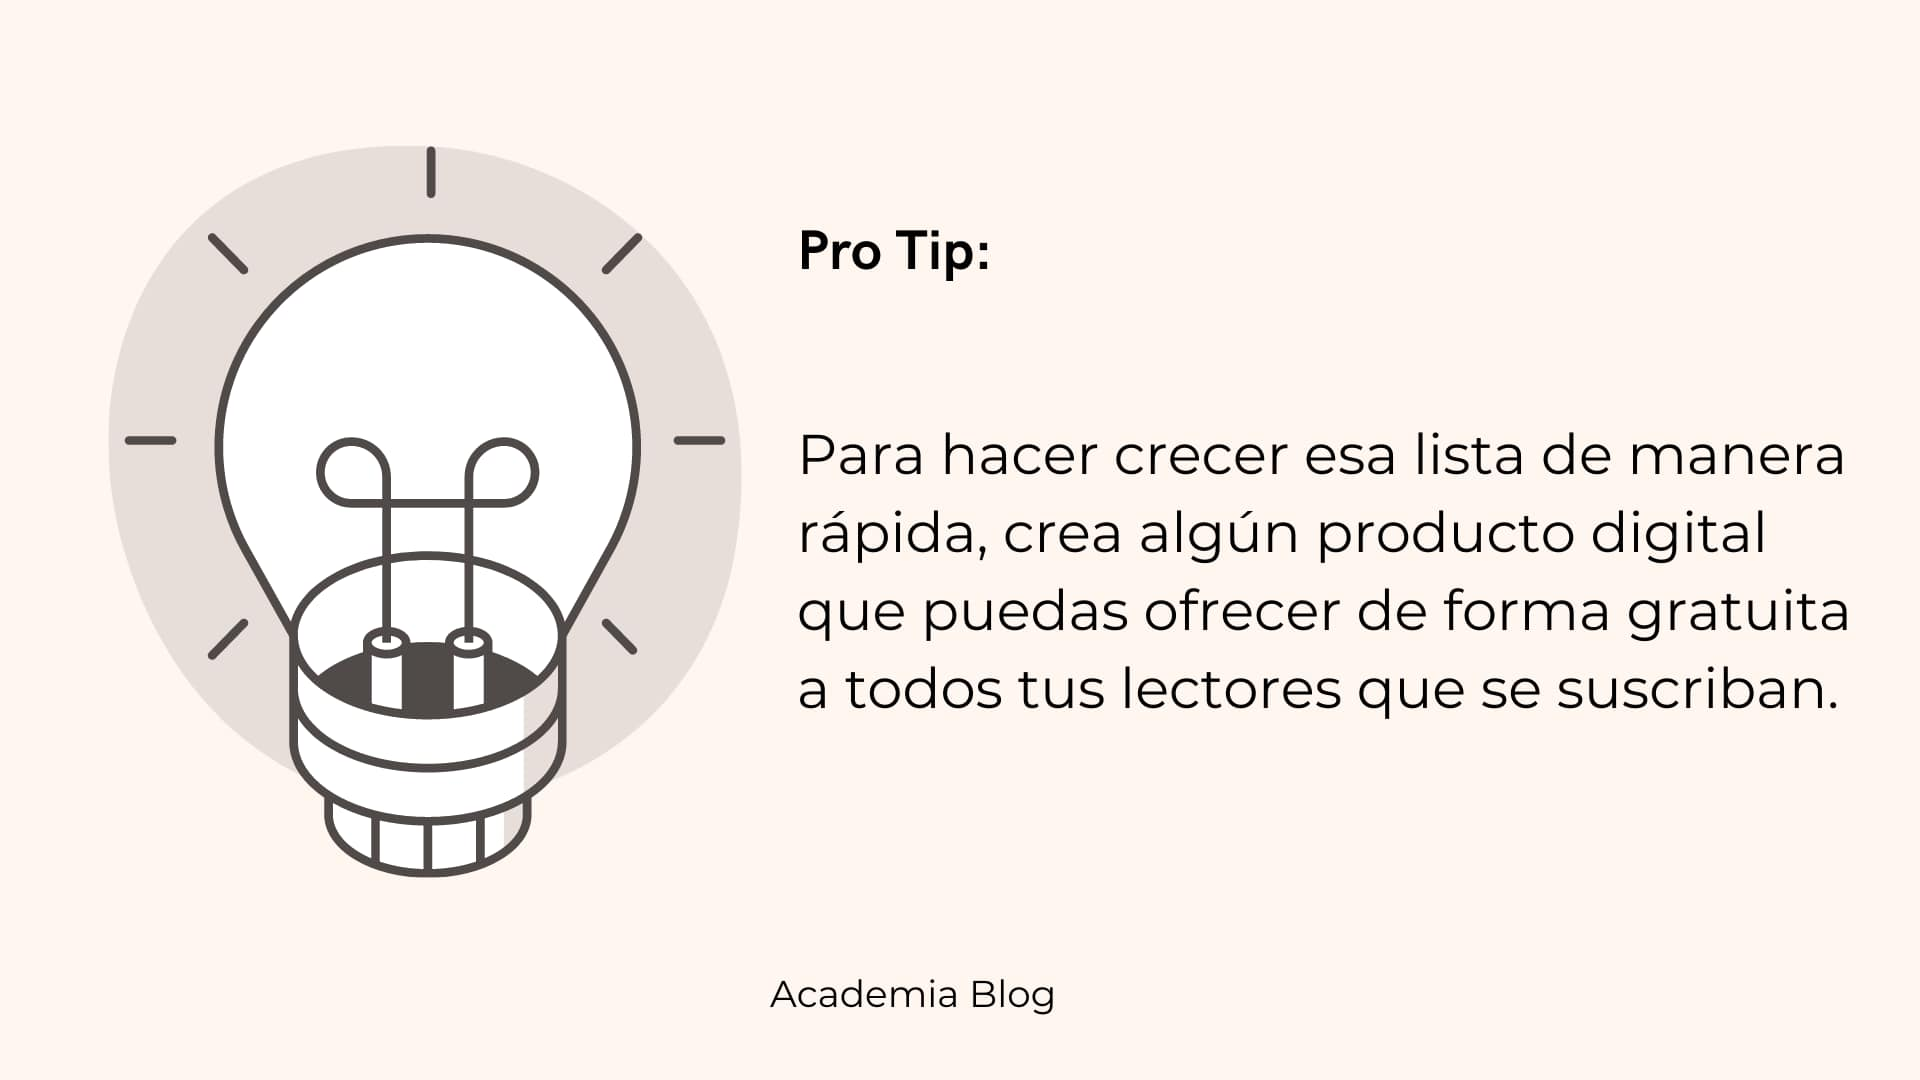 Pro tip para crear tu lista